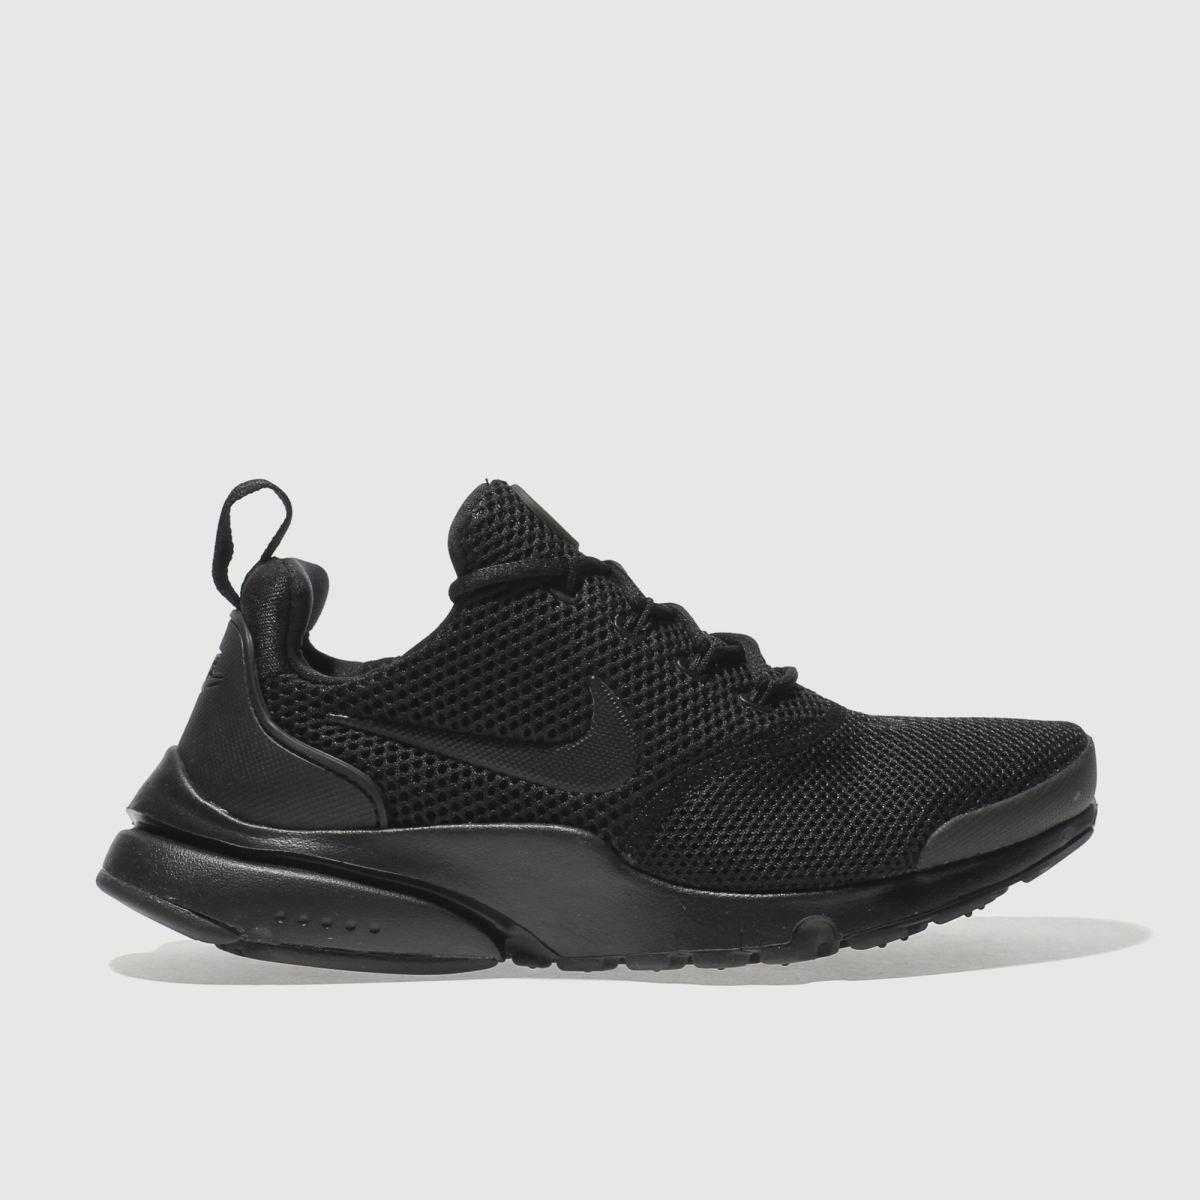 Kids Unisex Black Nike Presto Fly Trainers Schuh